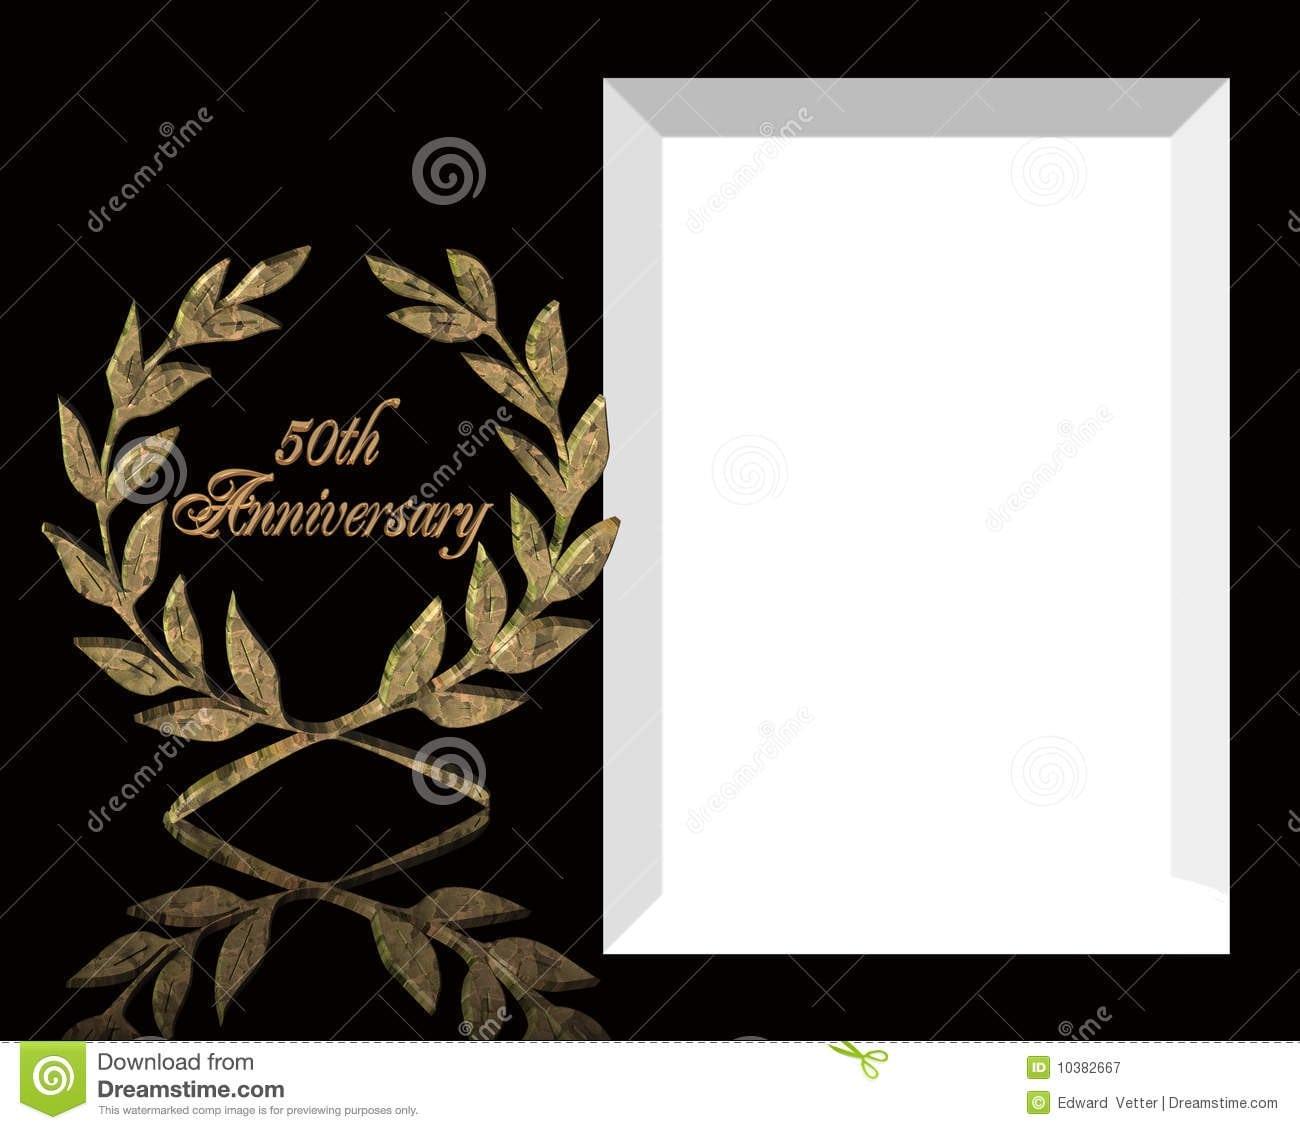 50th Wedding Anniversary Invitations Templates